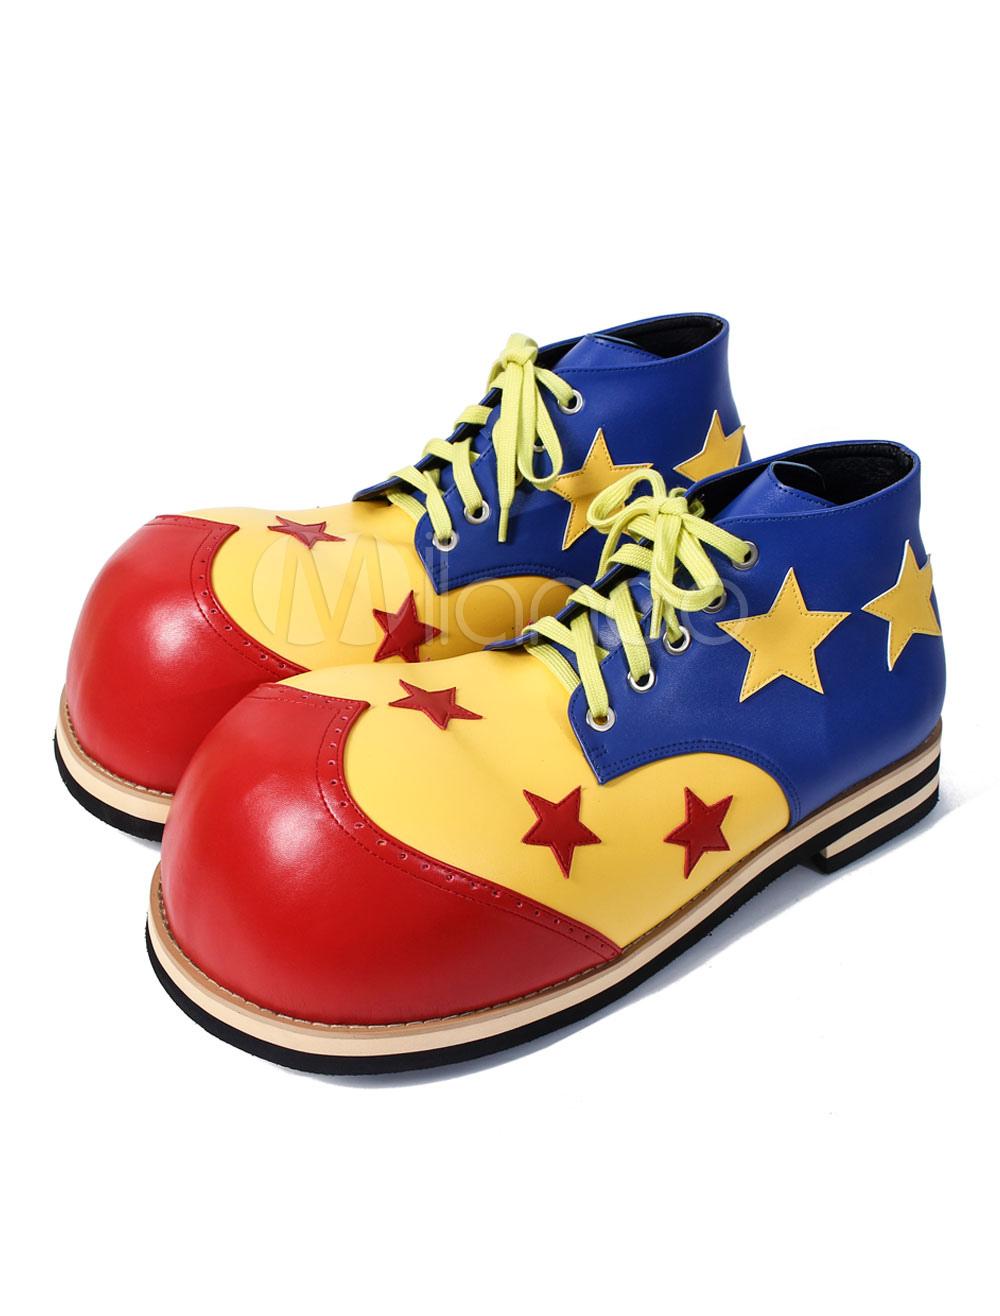 Halloween Circus Clown Polyurethane Cosplay Shoes